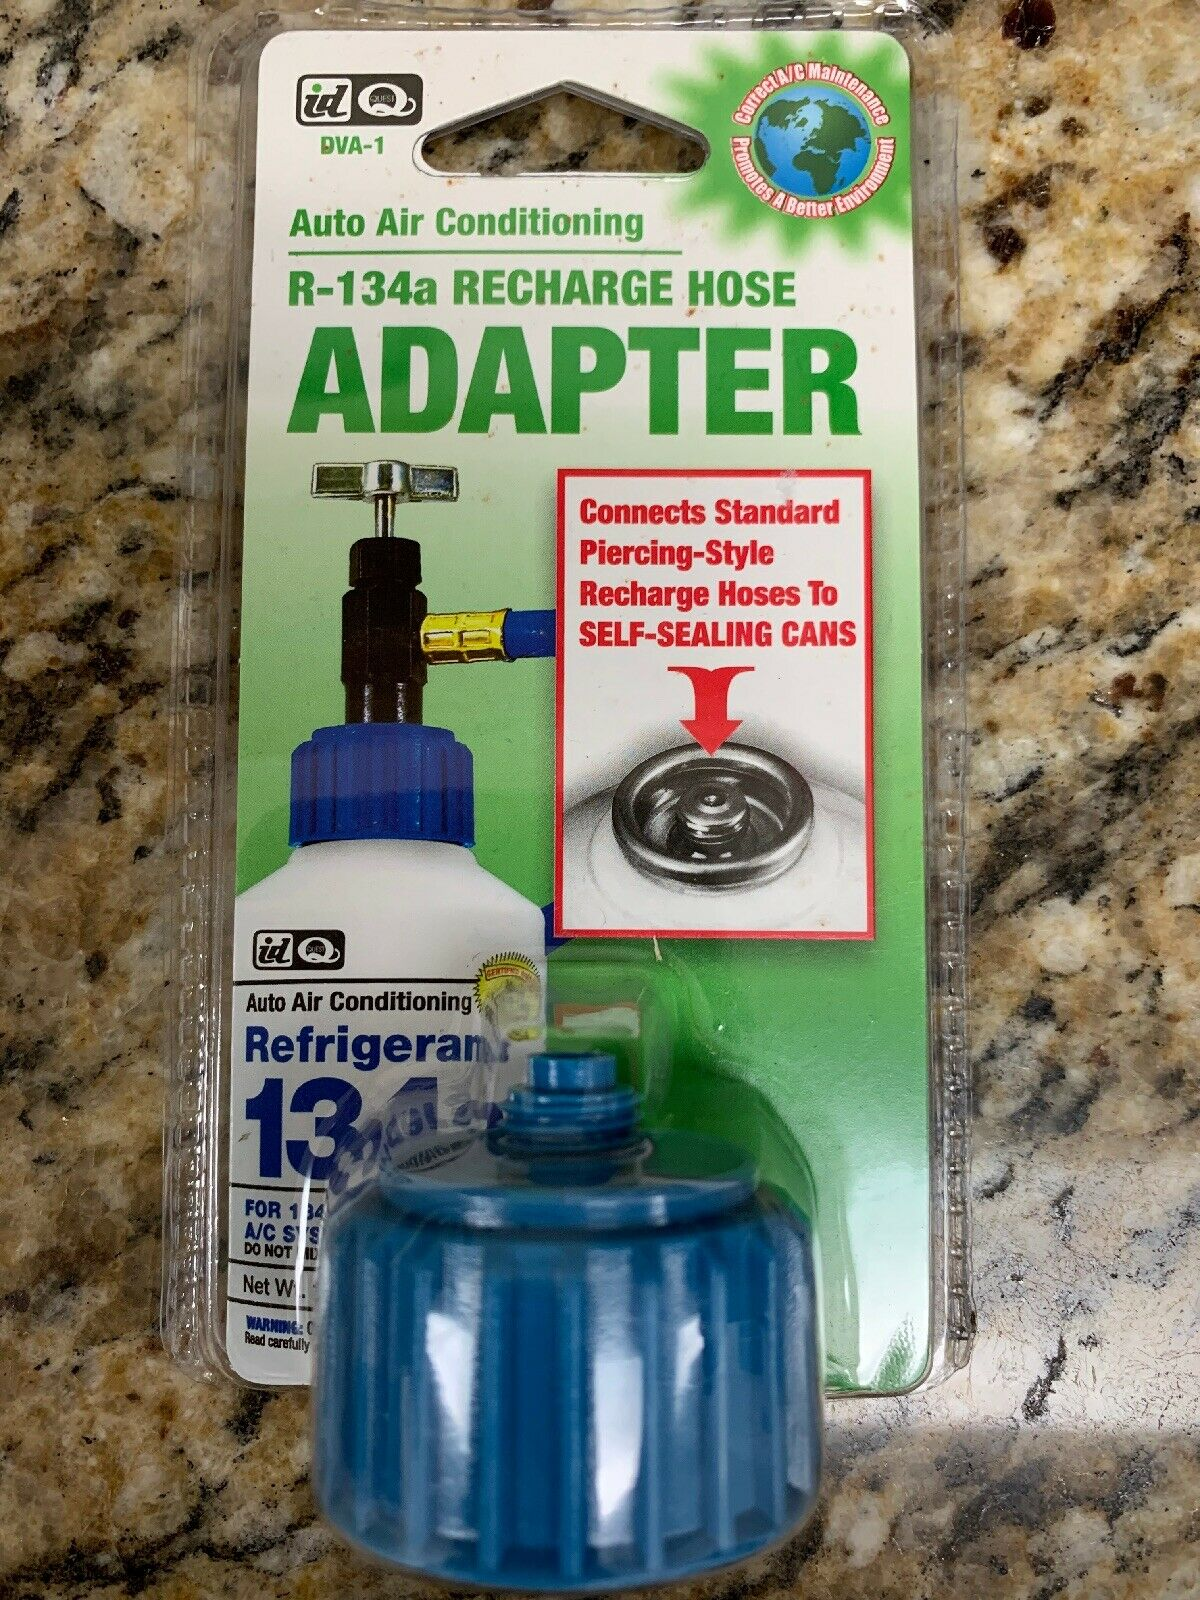 DVA1 R-134a Self-Sealing Can tapper Adapter Recharge Hose Interdynamics